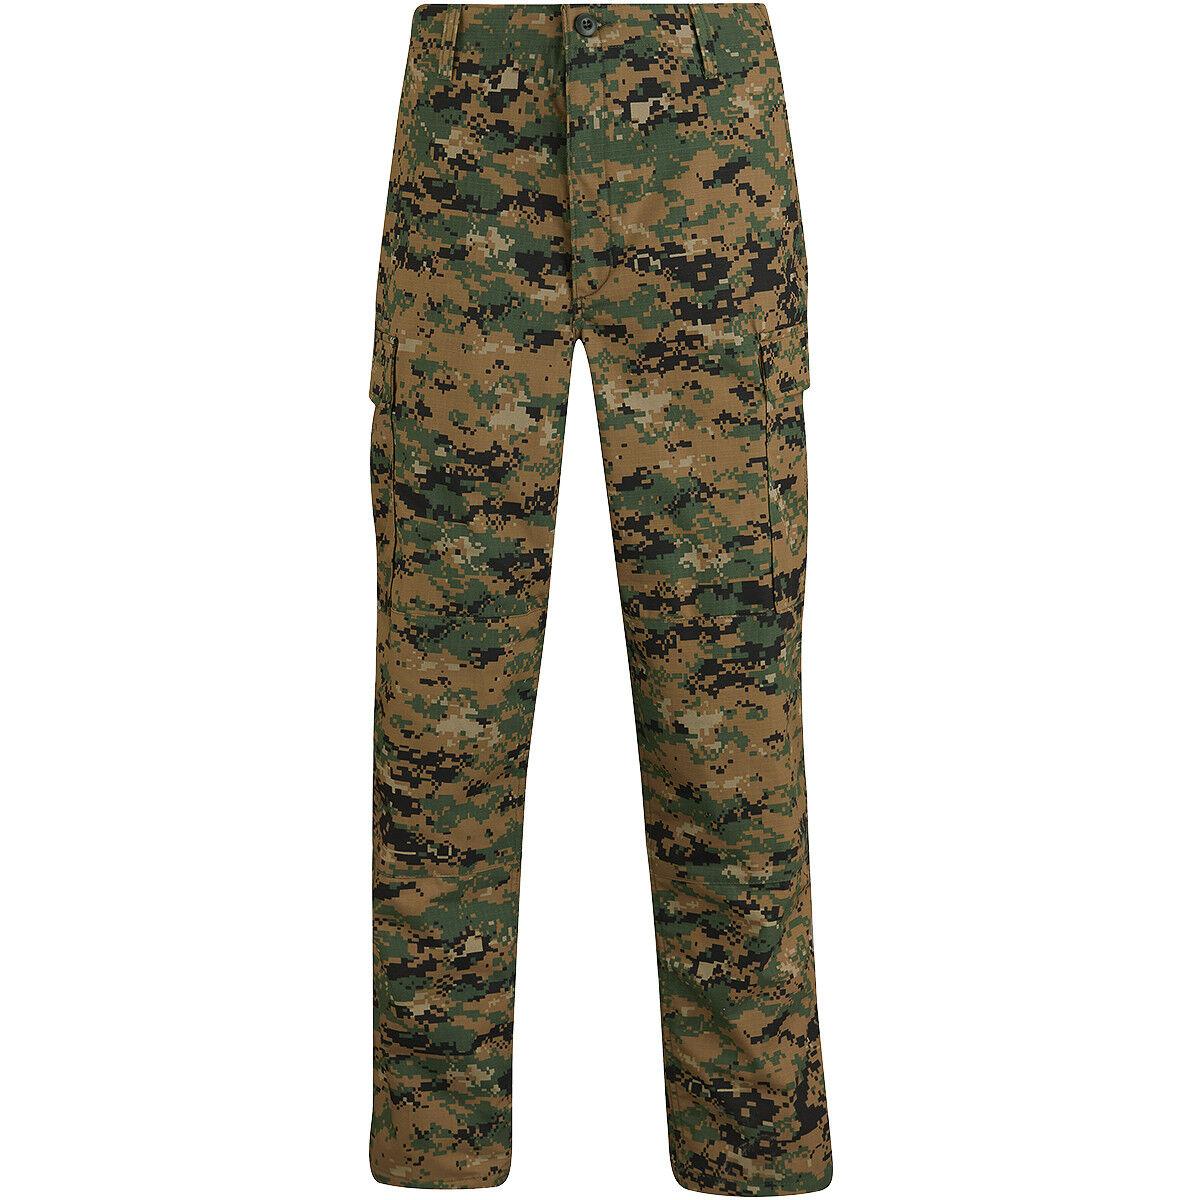 Propper Bdu Uniforme Pantaloni Ripstop Uomo Caccia Cargos Digital Woodland